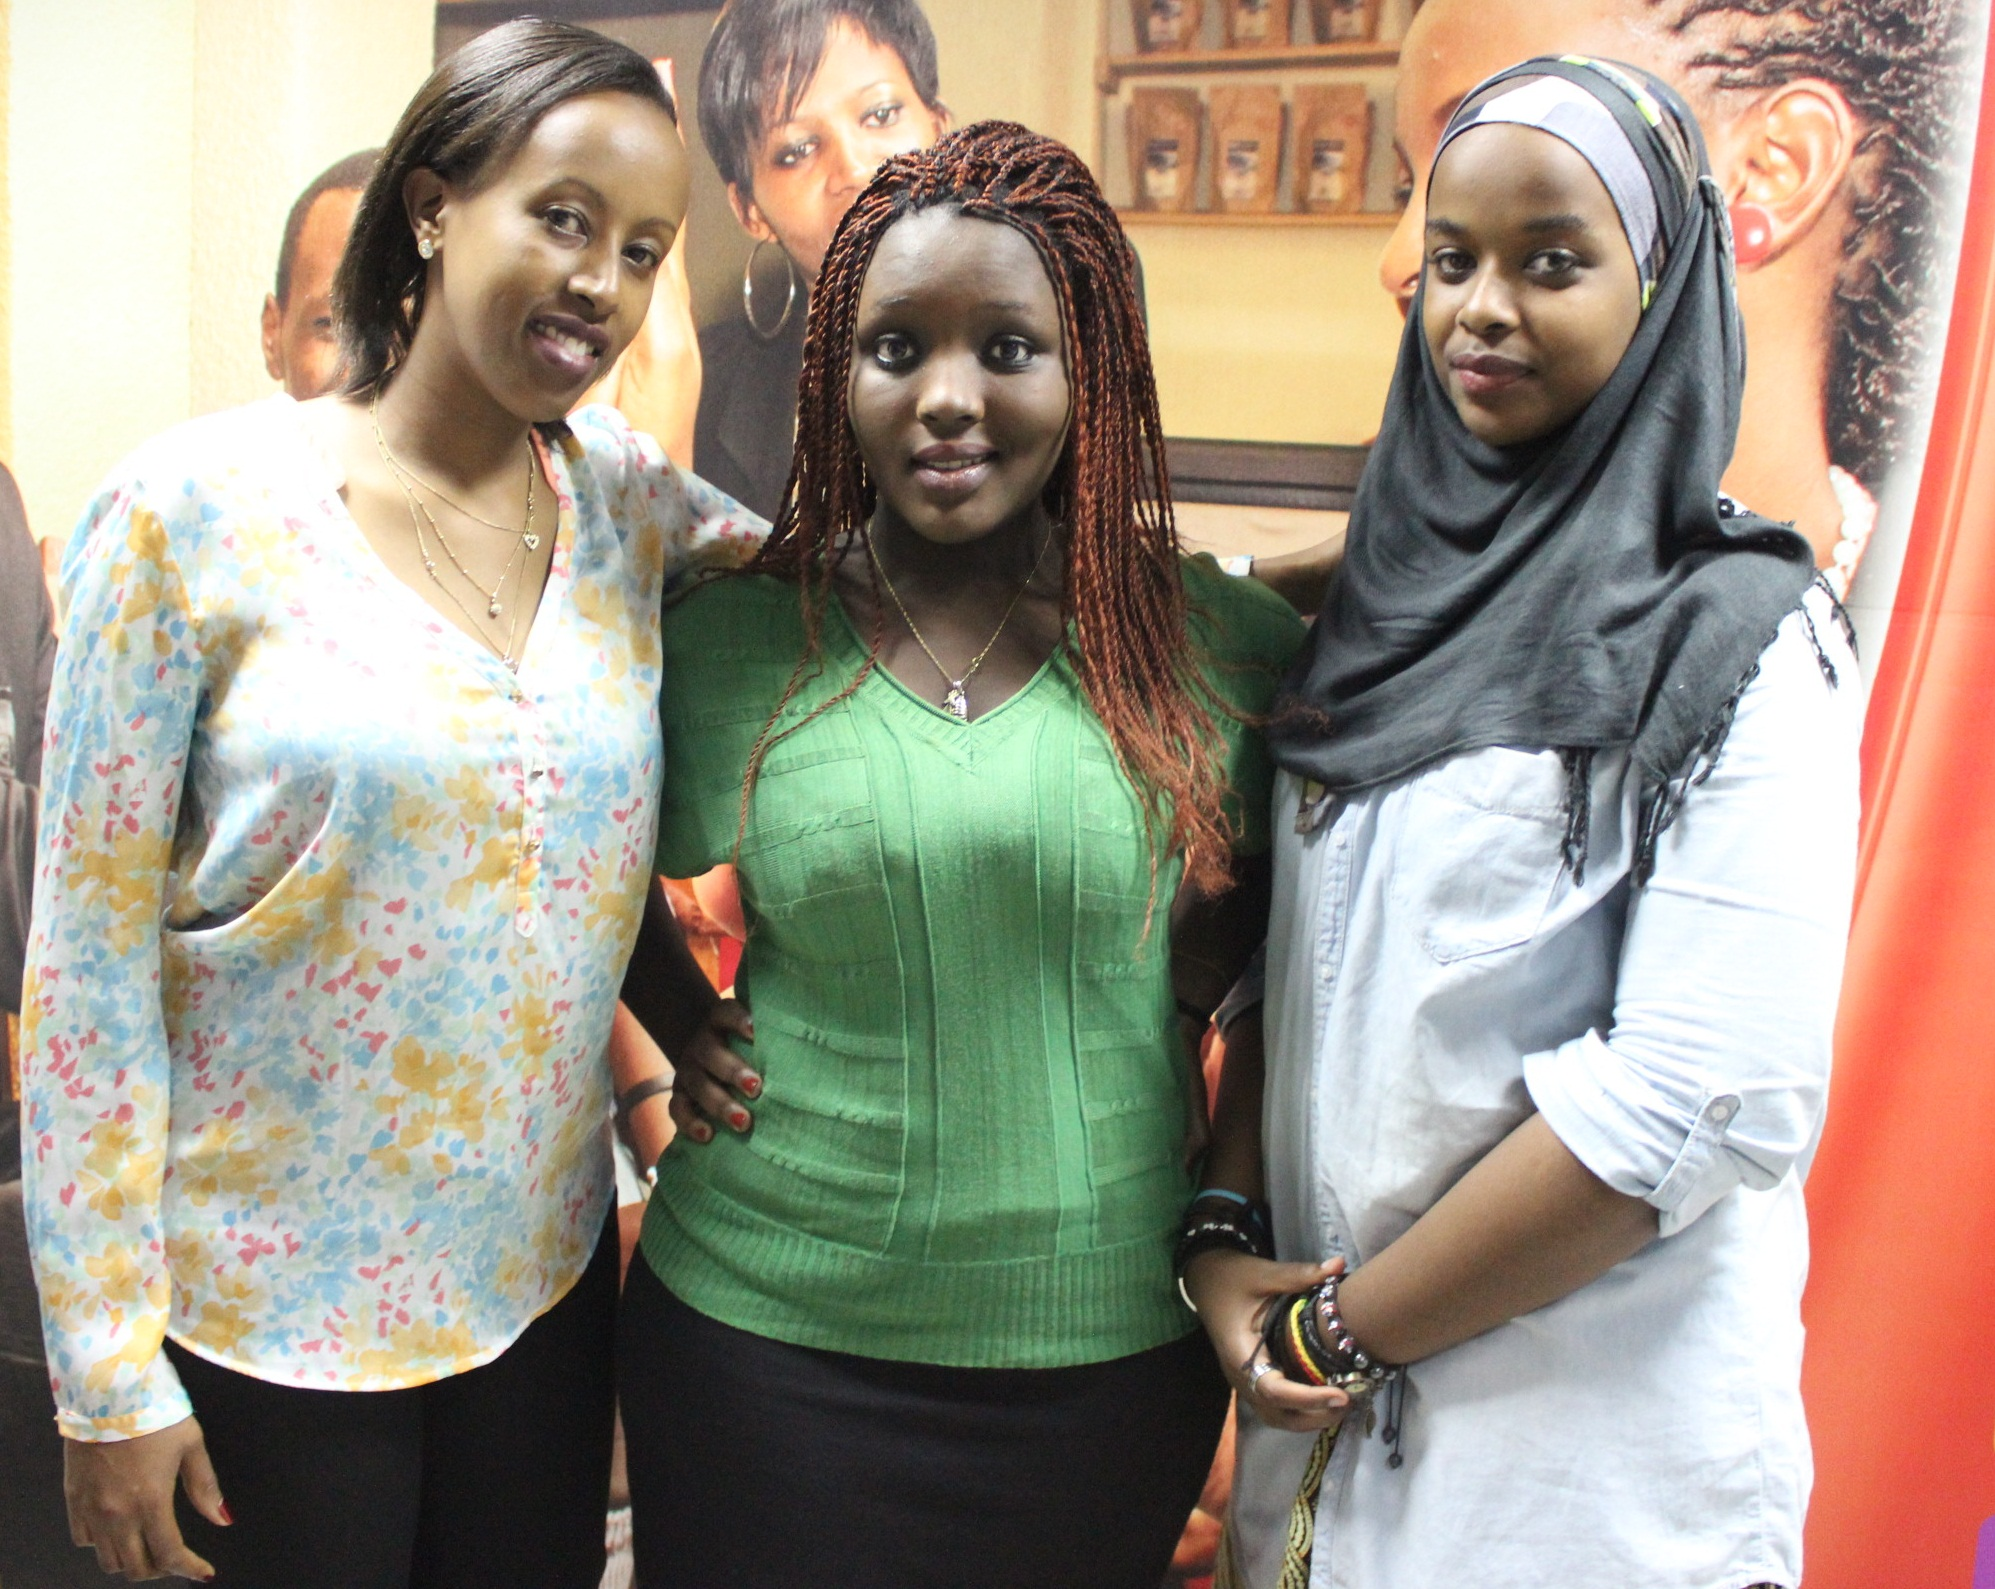 Rwanda ladies photos